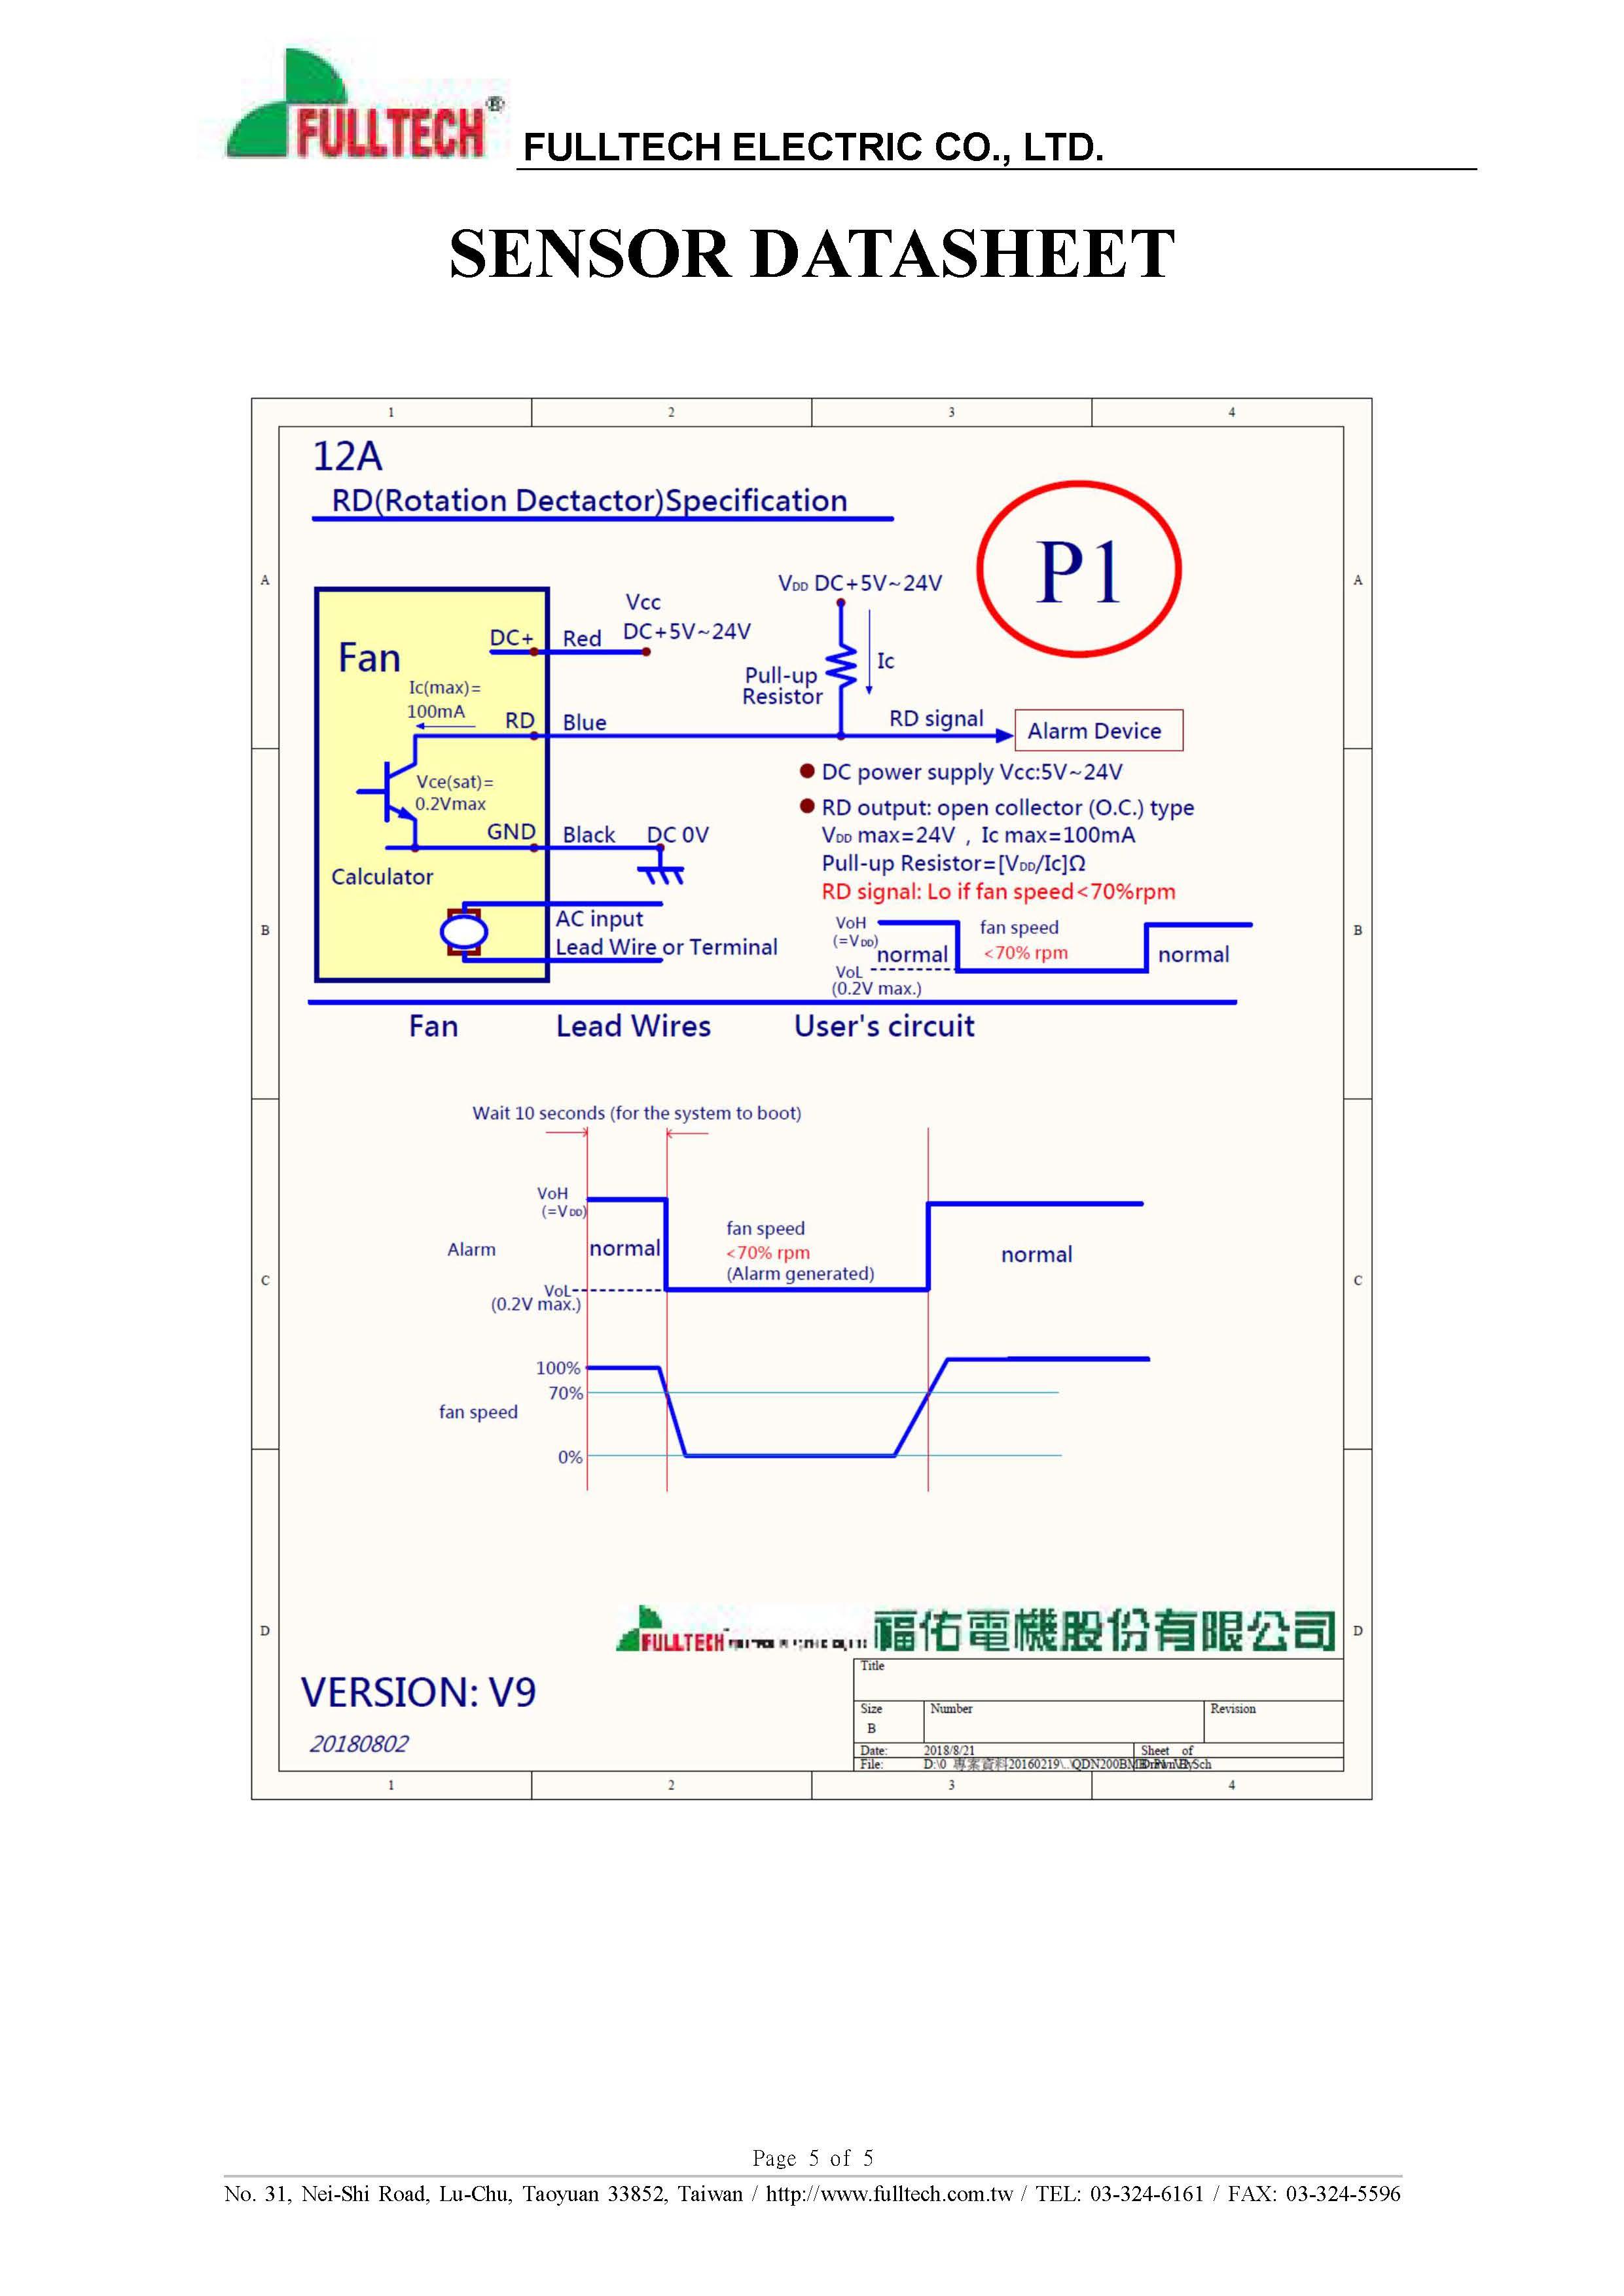 UF12A23BTHP1 Data sheet_페이지_5.jpg